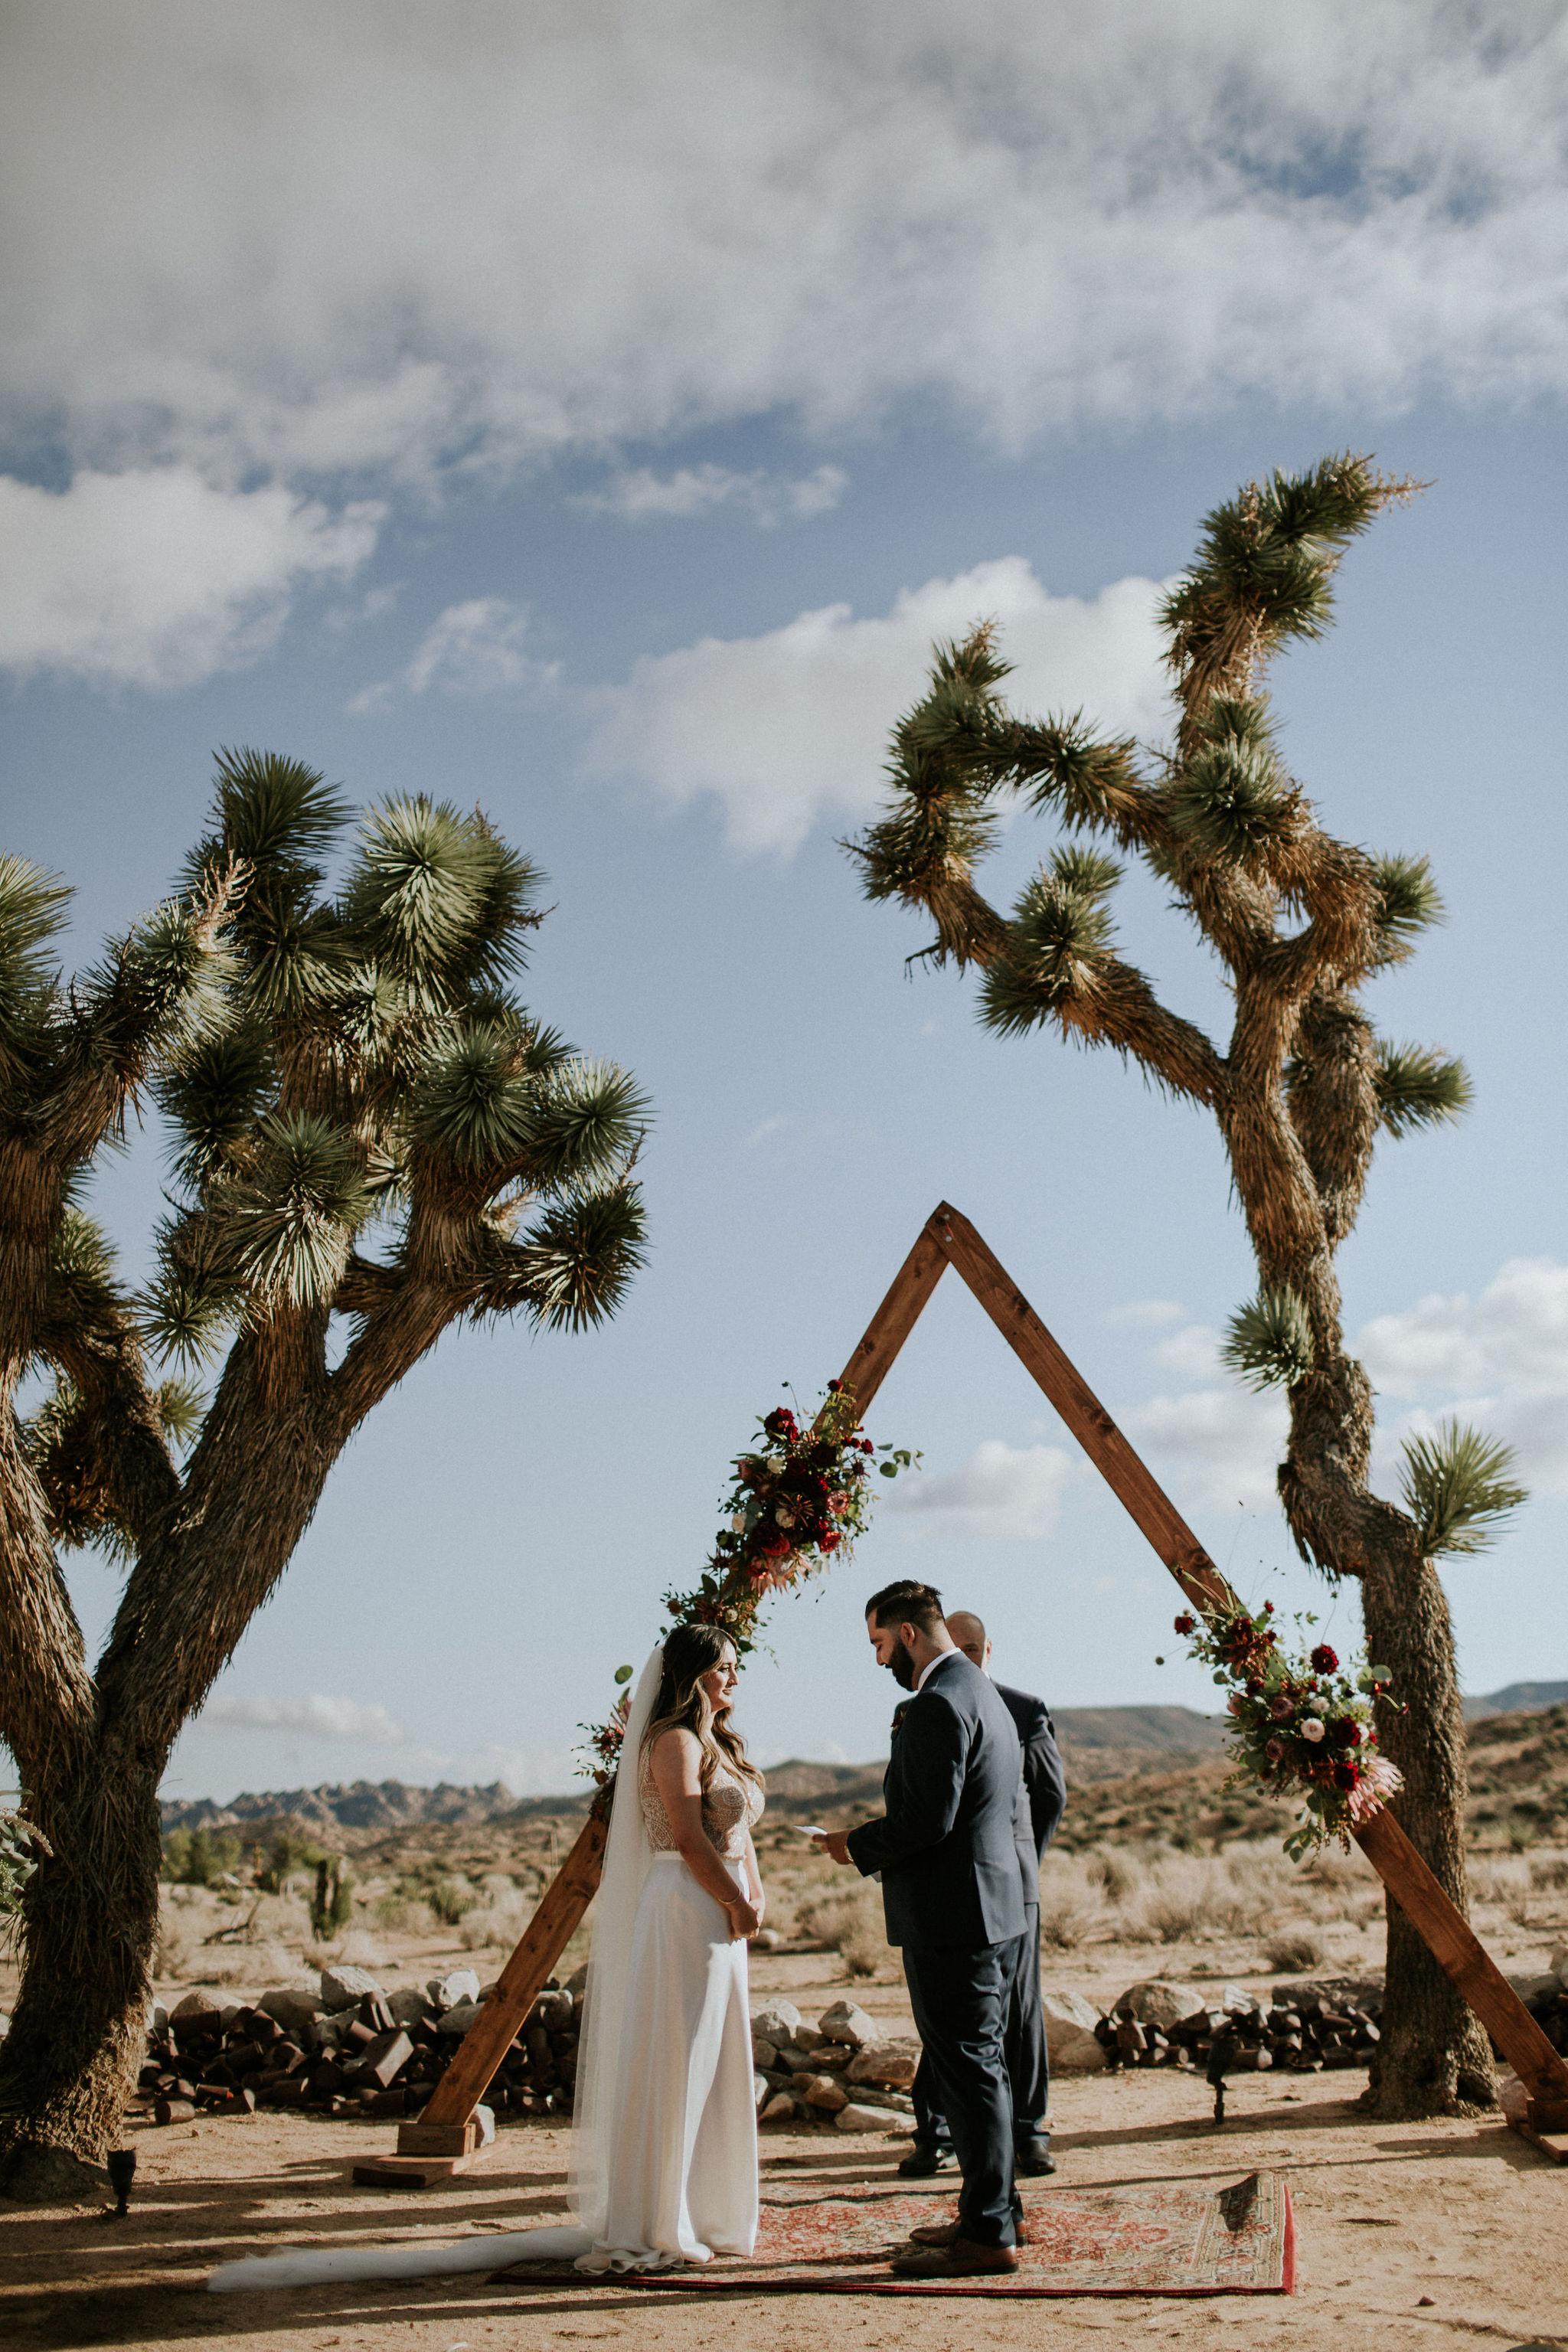 RimrockRanch-JoshuaTree-Wedding-Jami-Laree-337.jpg